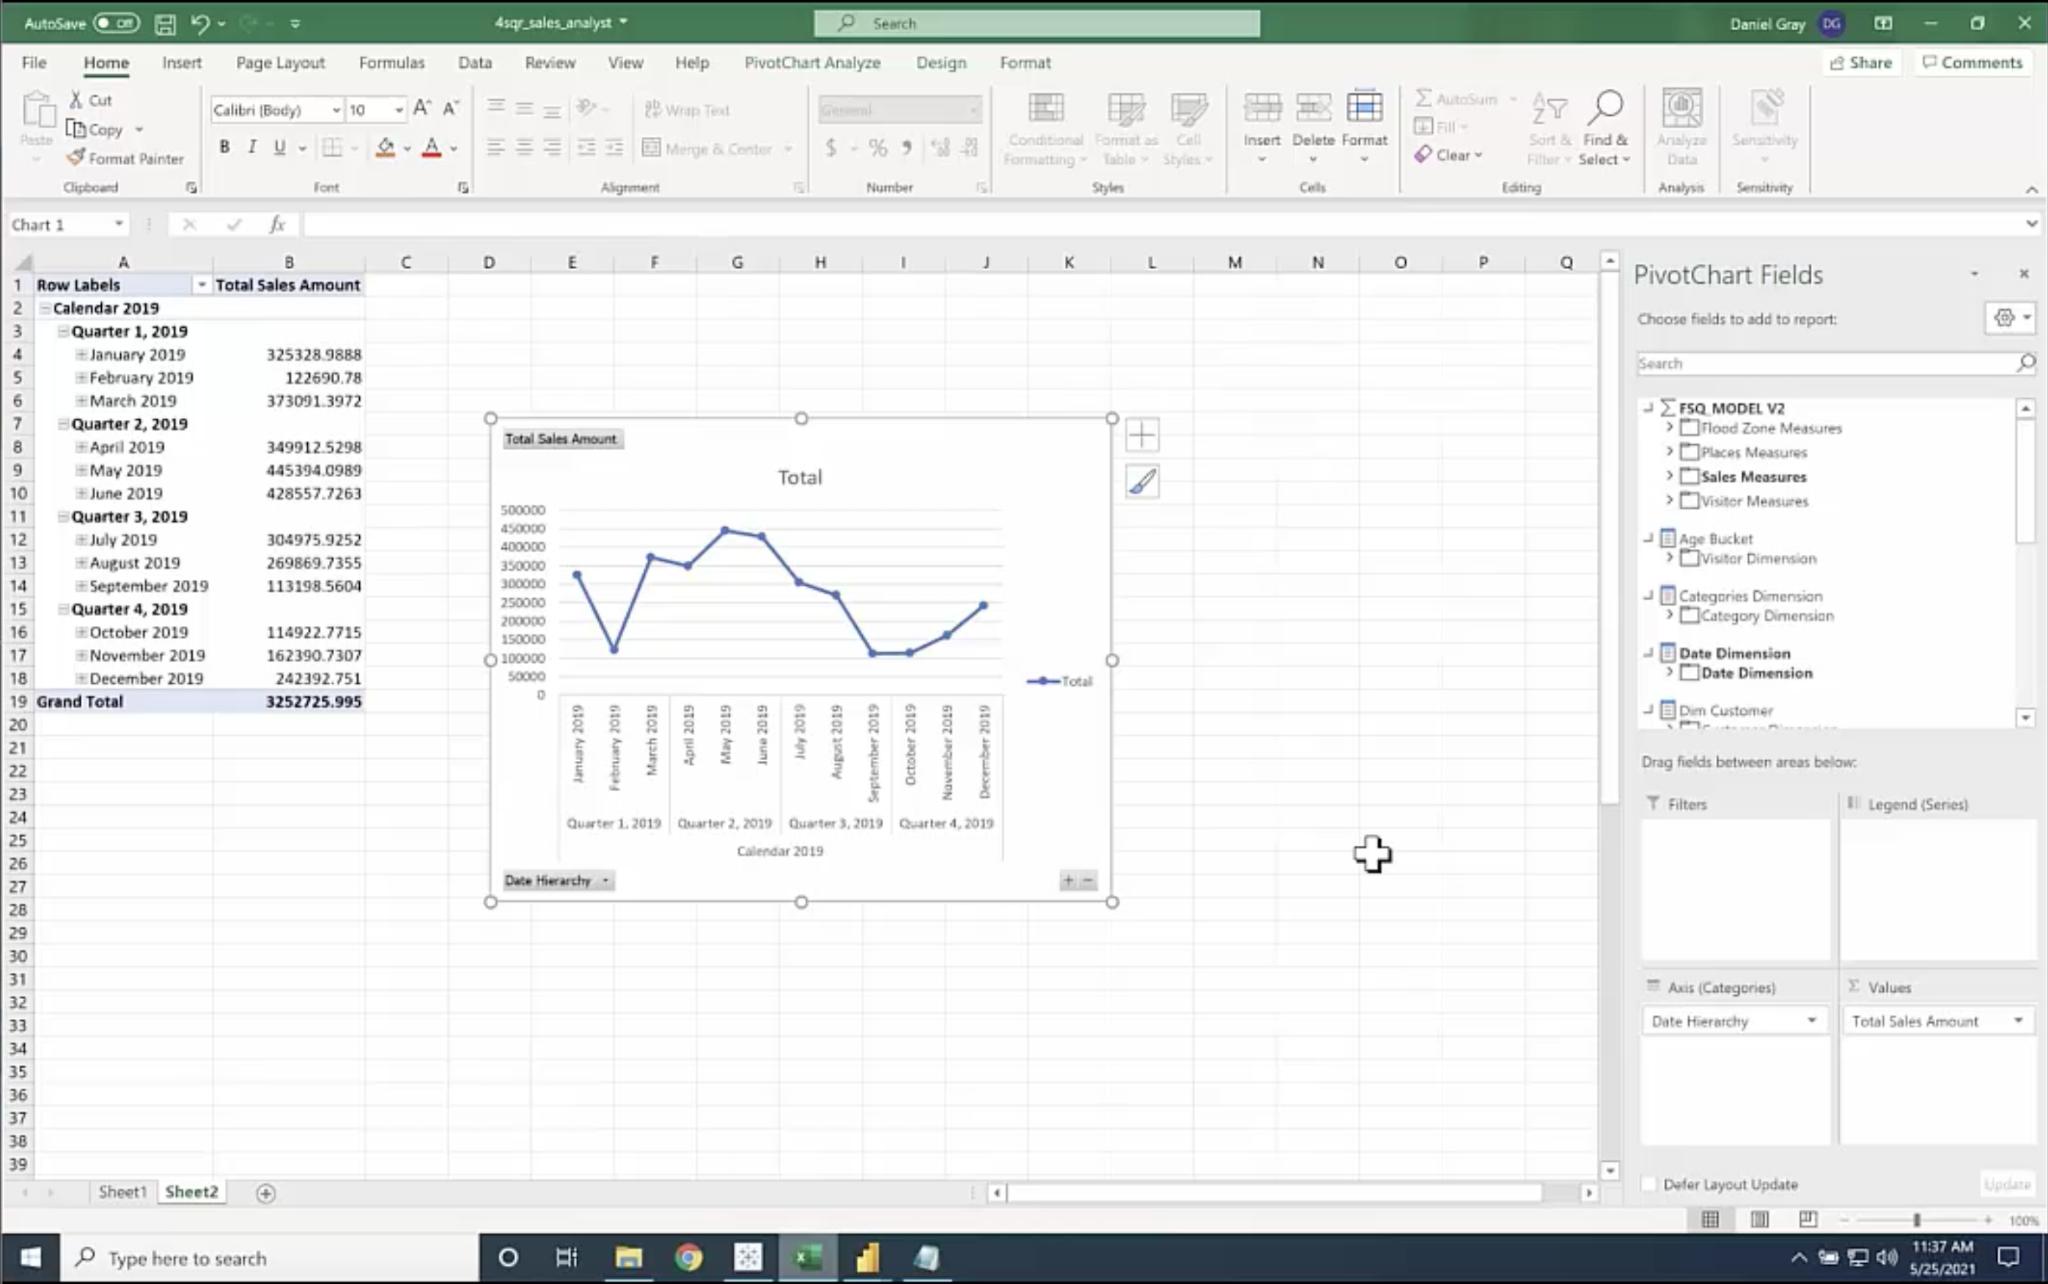 Excel Pivot Chart Analysis